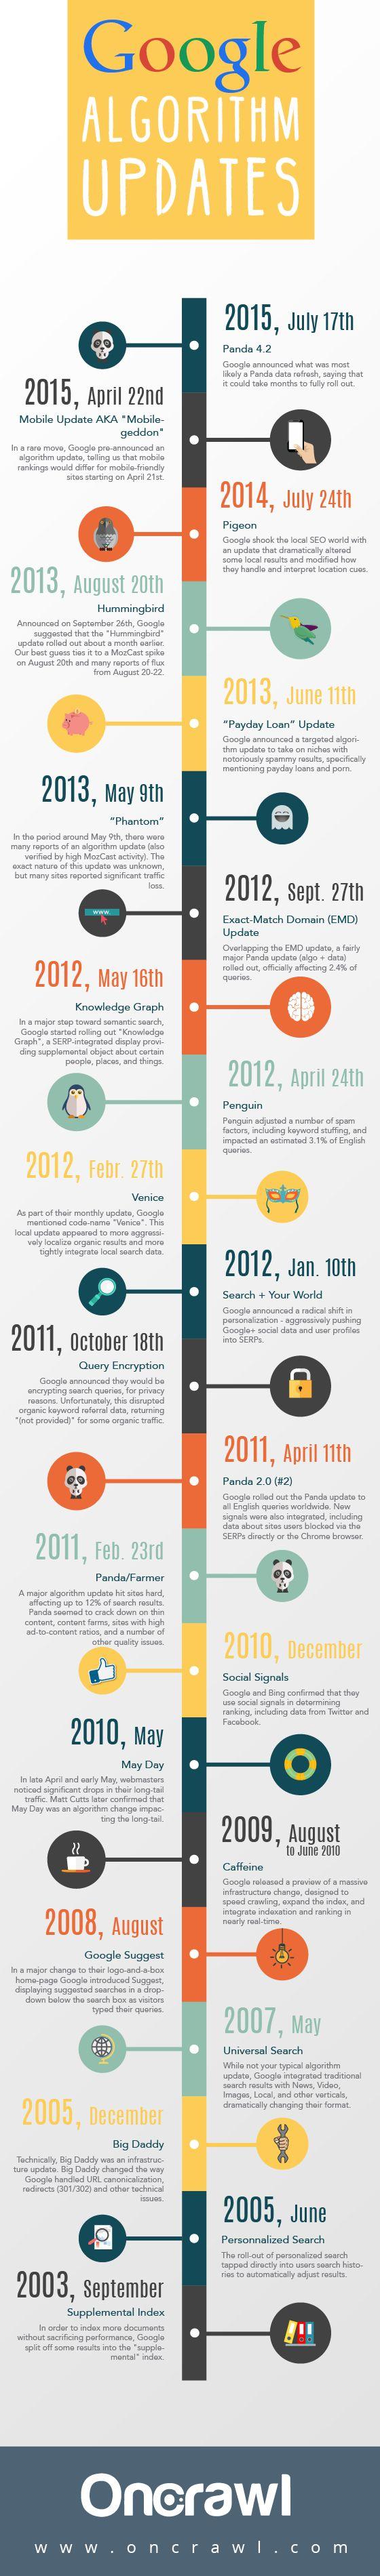 Google Algorithm Updates #infographic #SEO #GoogleUpdate #History